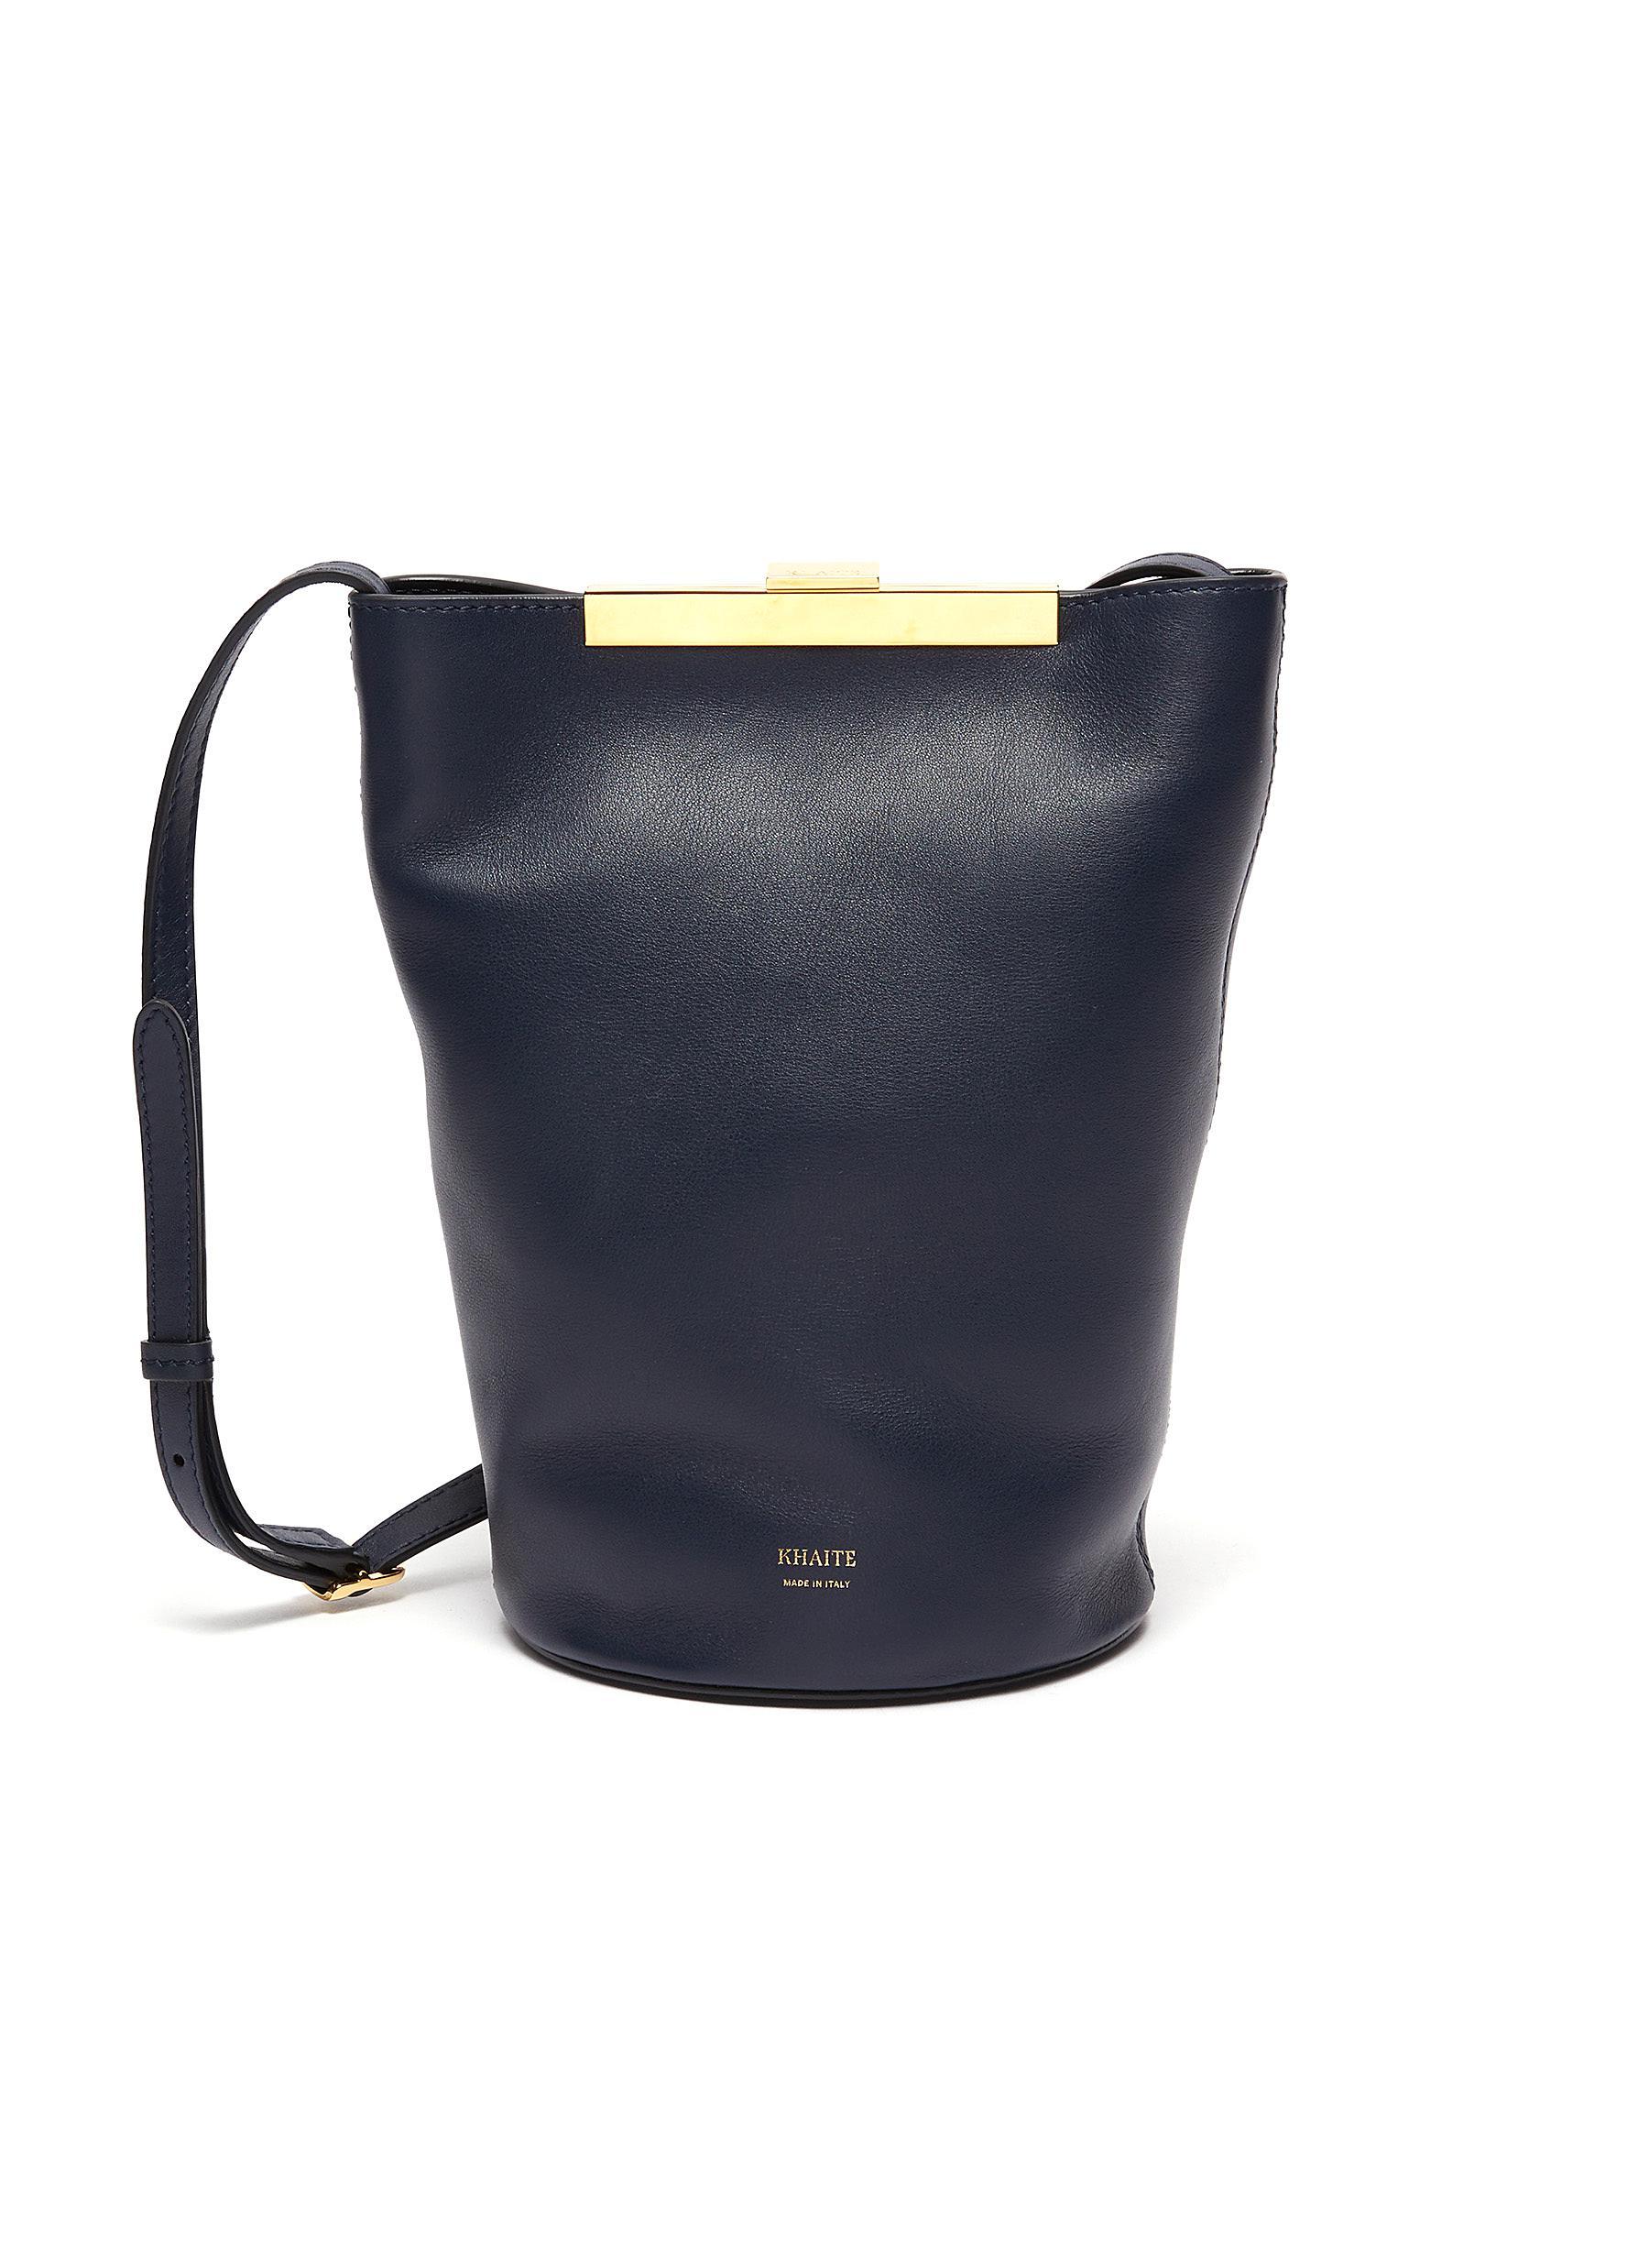 Etta' Crossbody Leather Bag